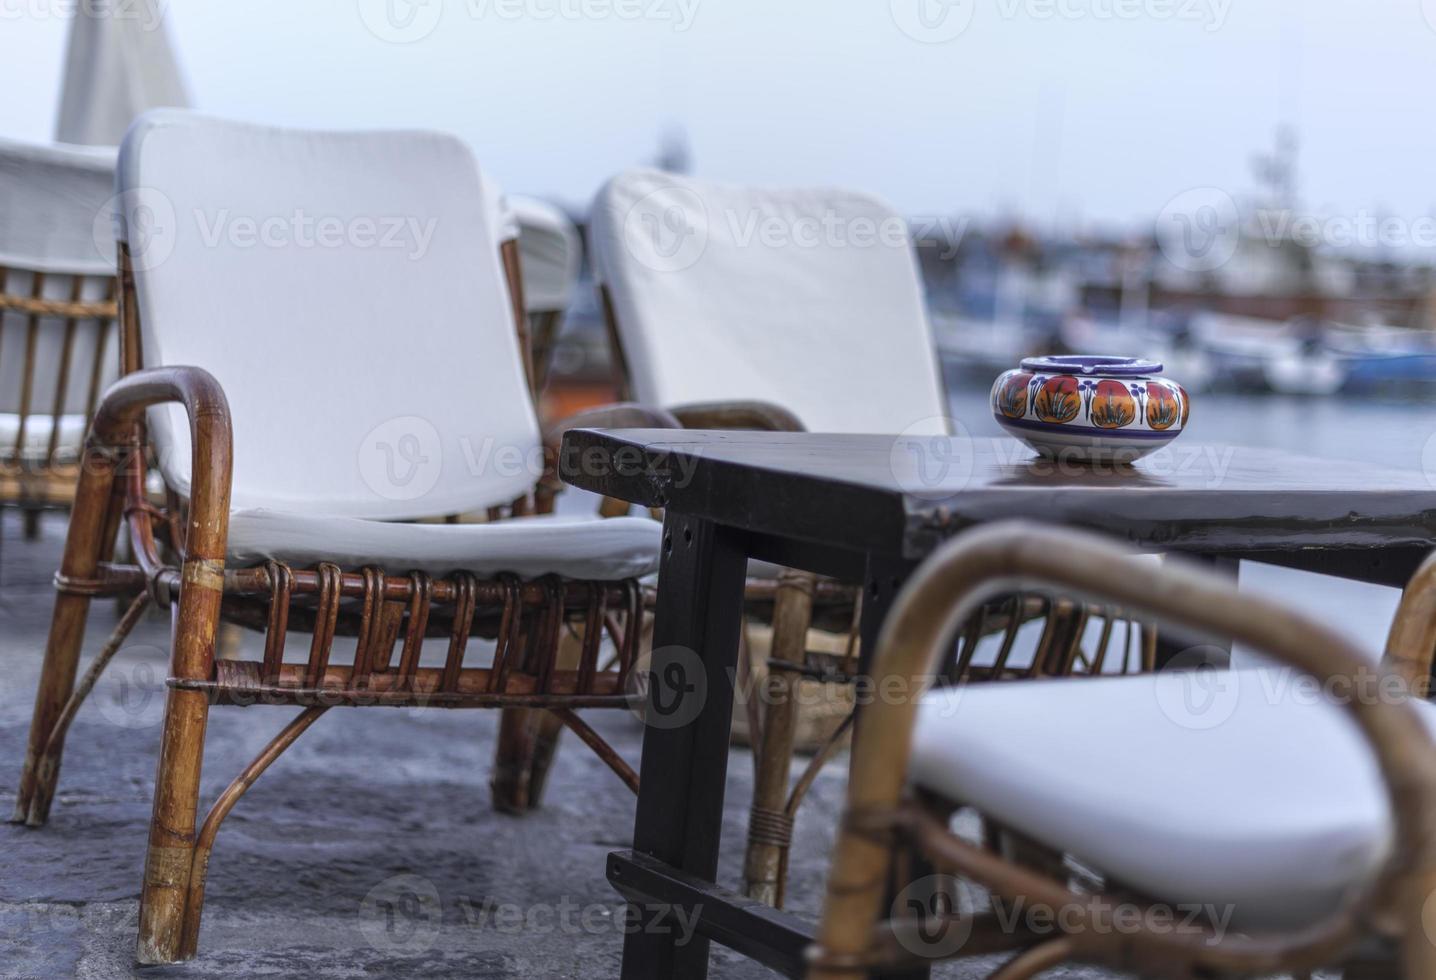 sant'angelo d'ischia, bar port. italo relax. mode photo